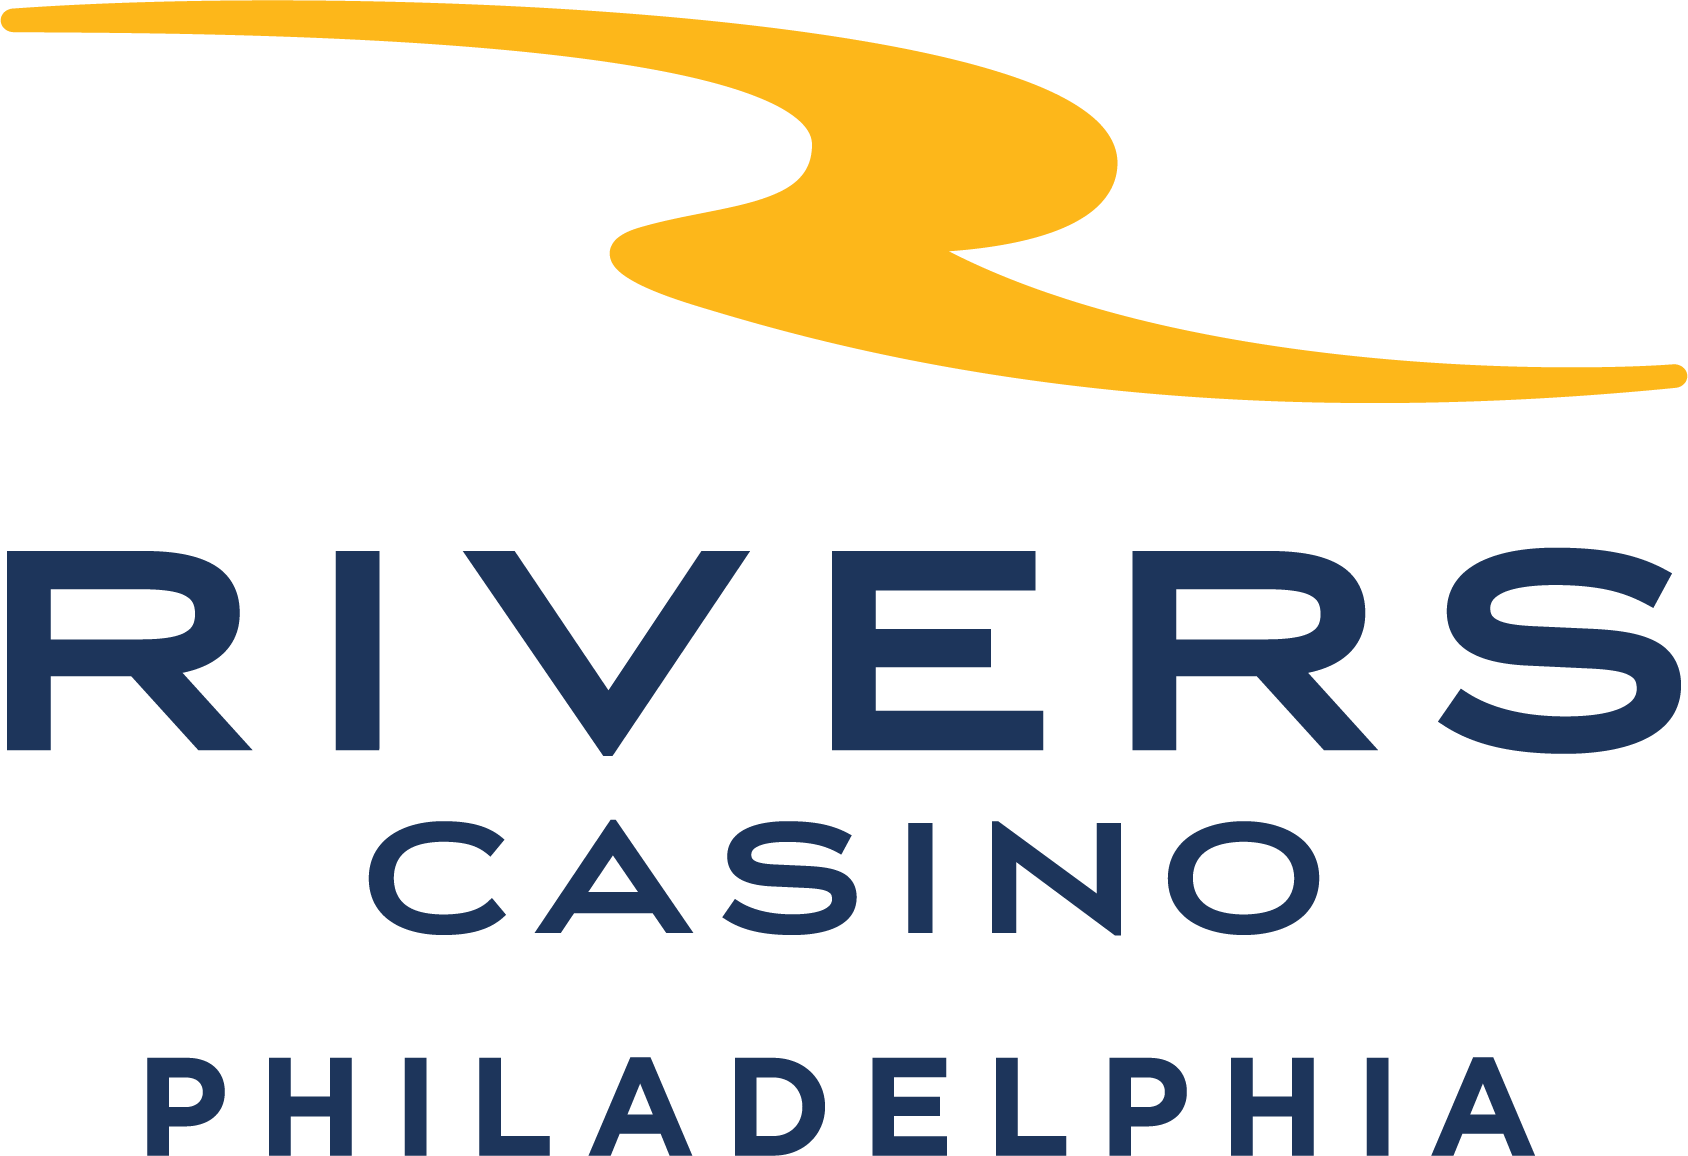 Rivers Casino Philadelphia logo